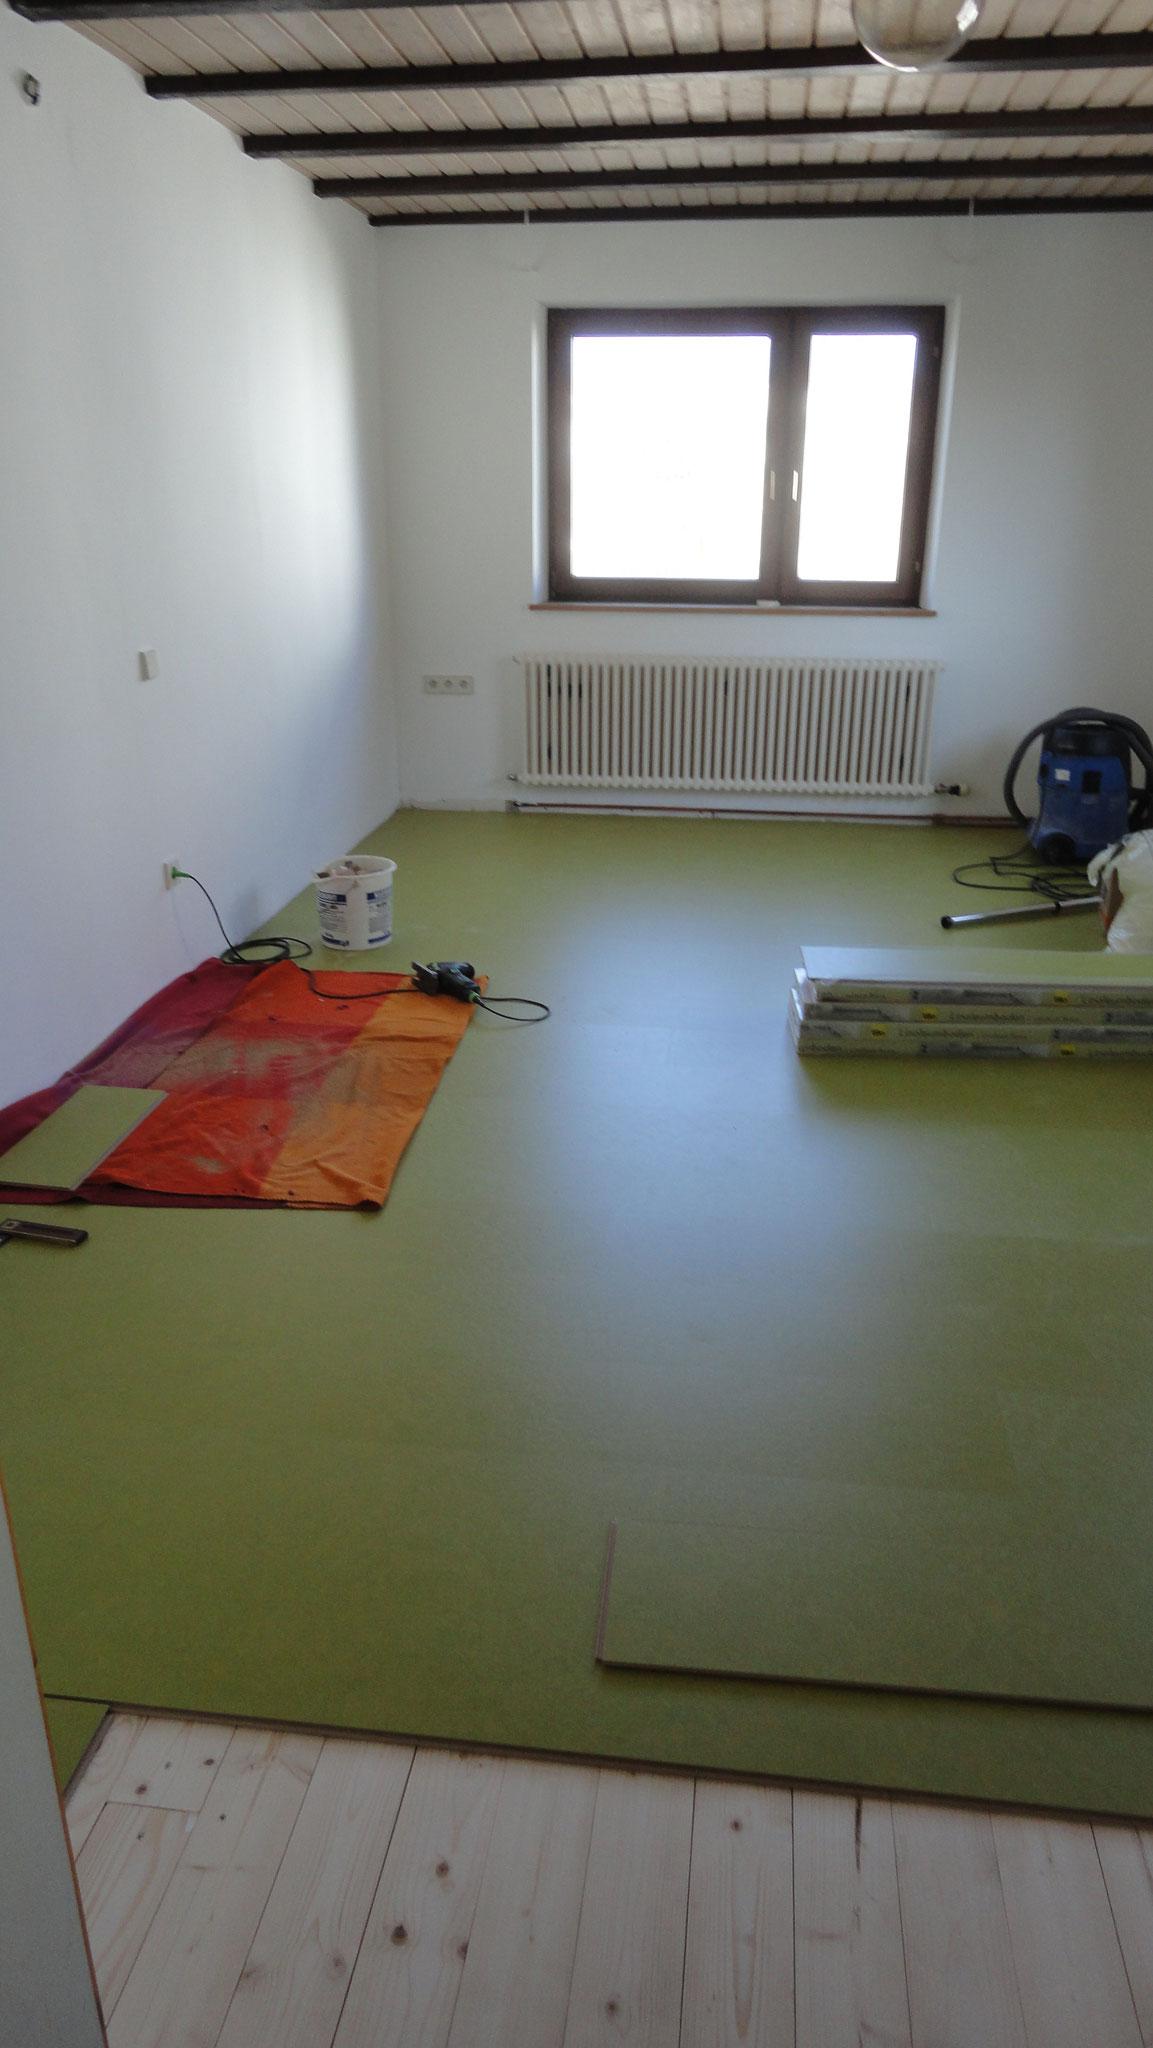 Fußboden / Linoleum-Parkett